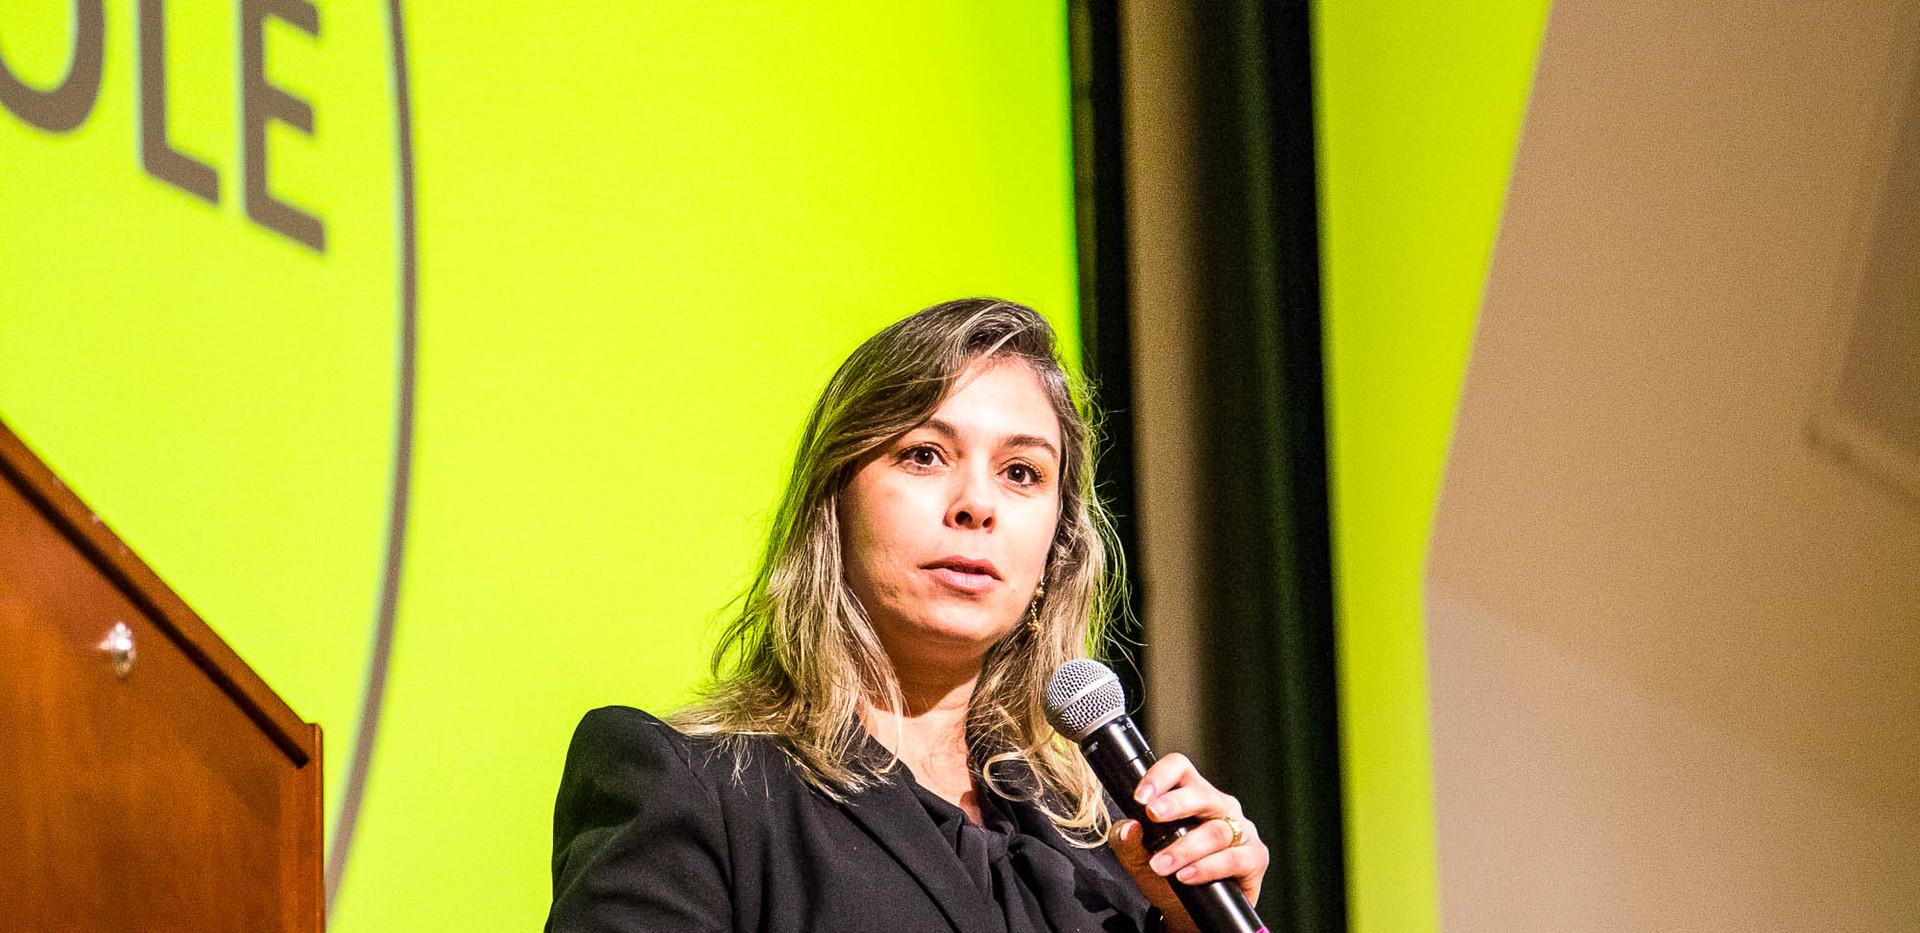 Brazil-FloridaStudentConference-77.jpg